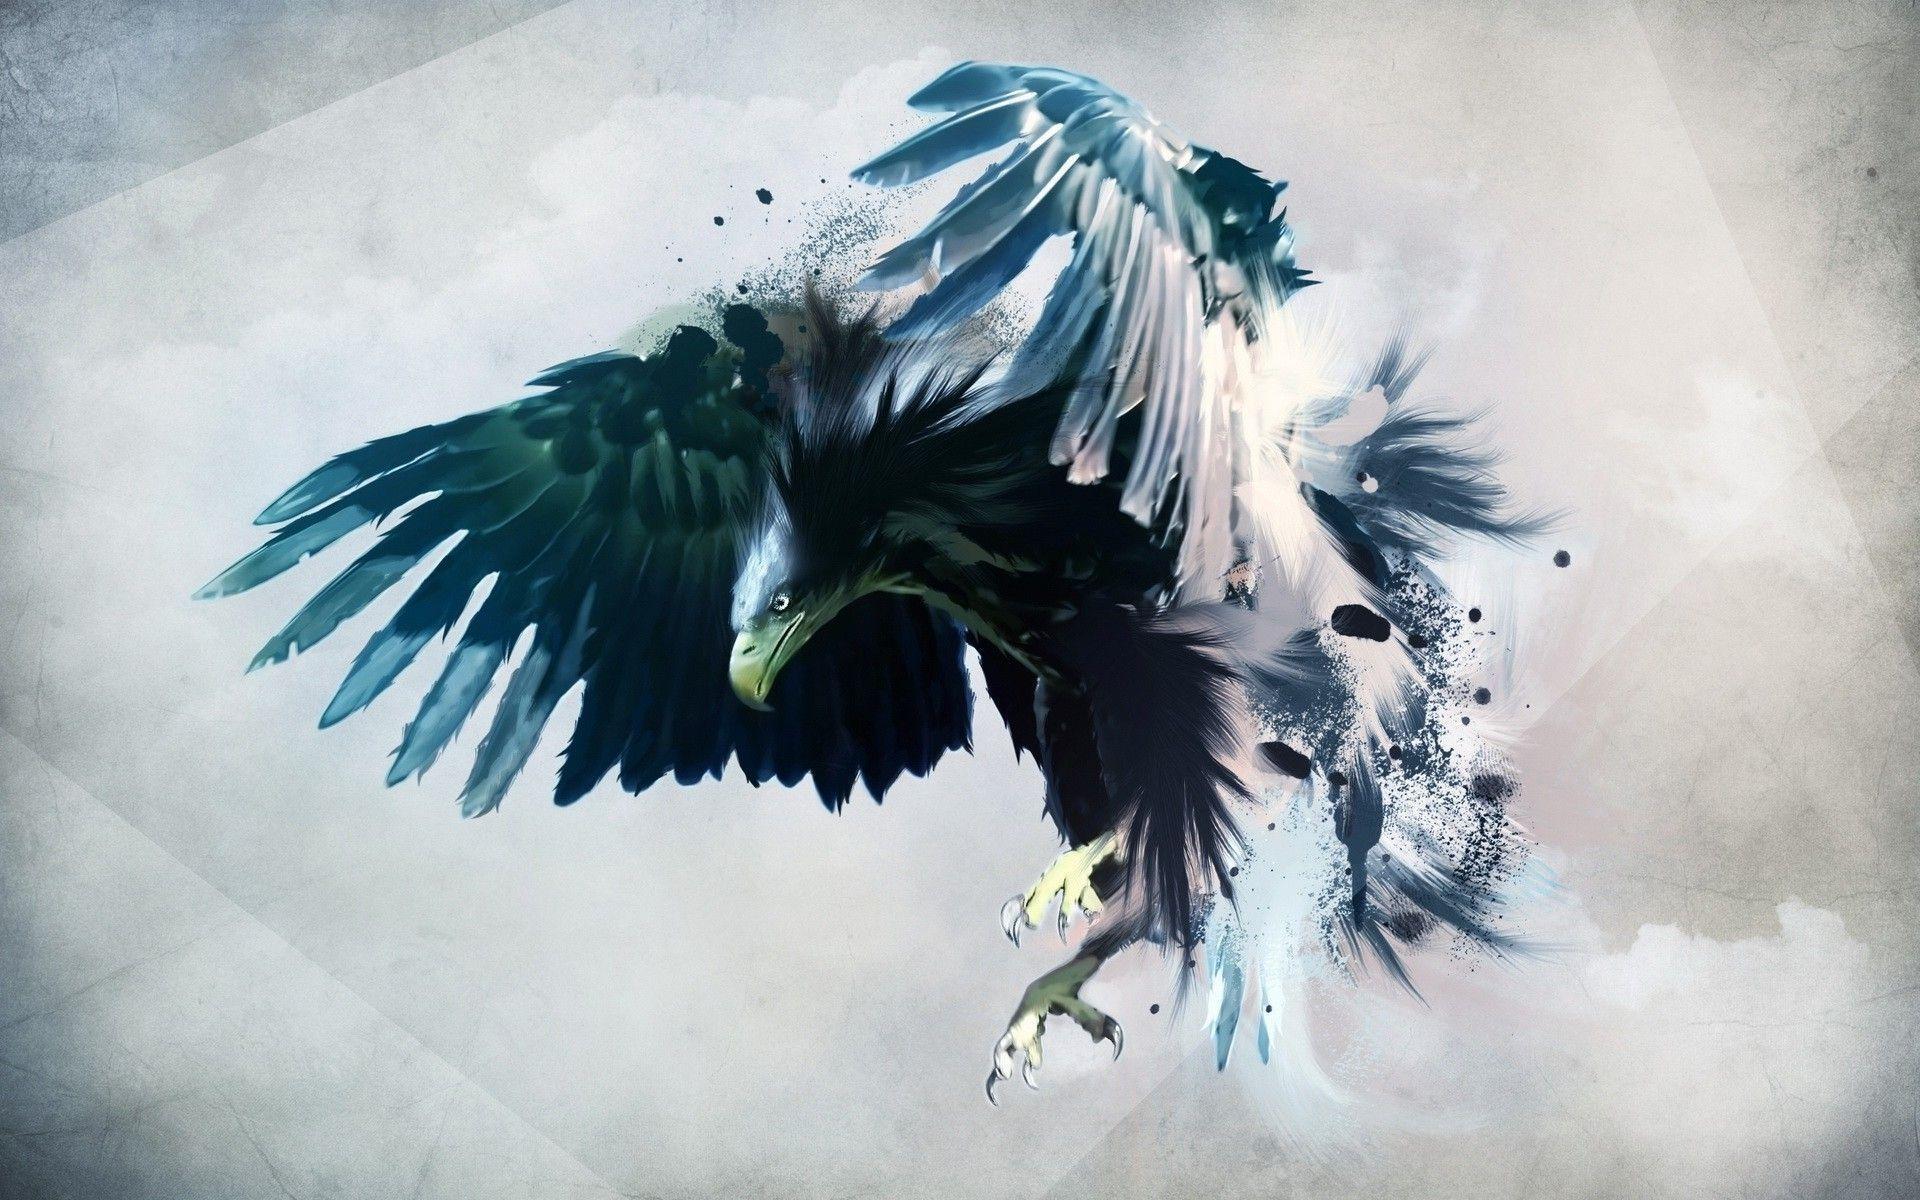 eagles wallpaper - photo #23